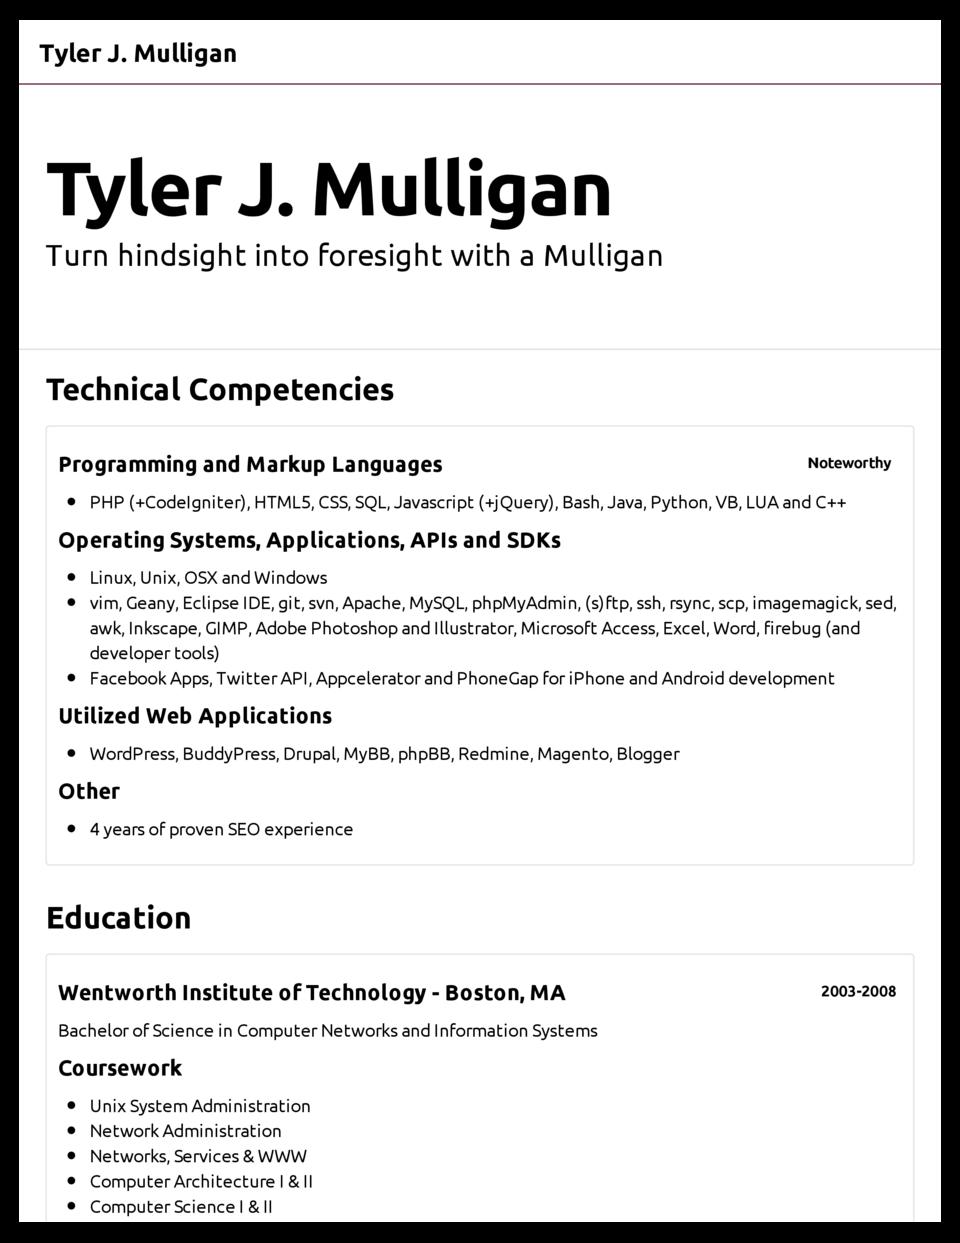 Basic Resume Template Pdf Http Www Resumecareer Info Basic Resume Template Pdf 5 Surat Tips Kerja